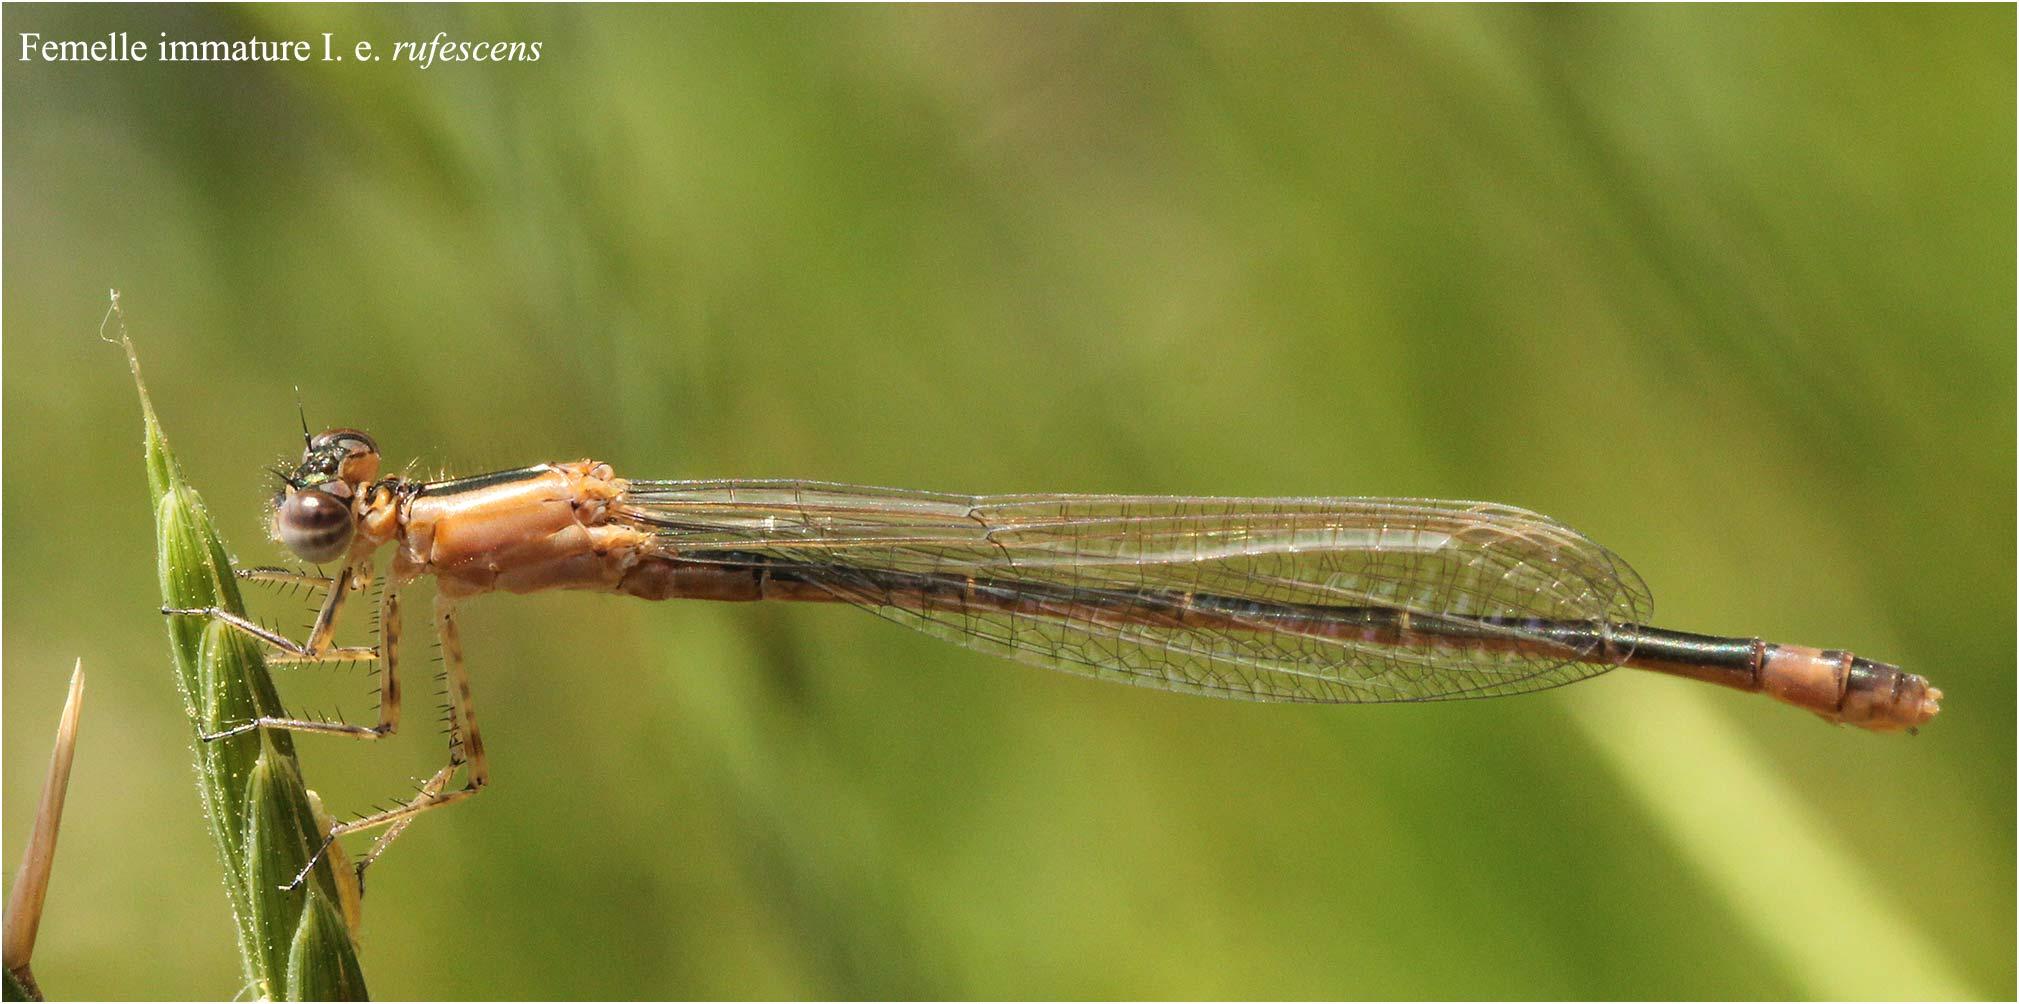 Ischnura elegans femelle immature rufescens, Etang de Péronne (France - 49), 04/06/2011